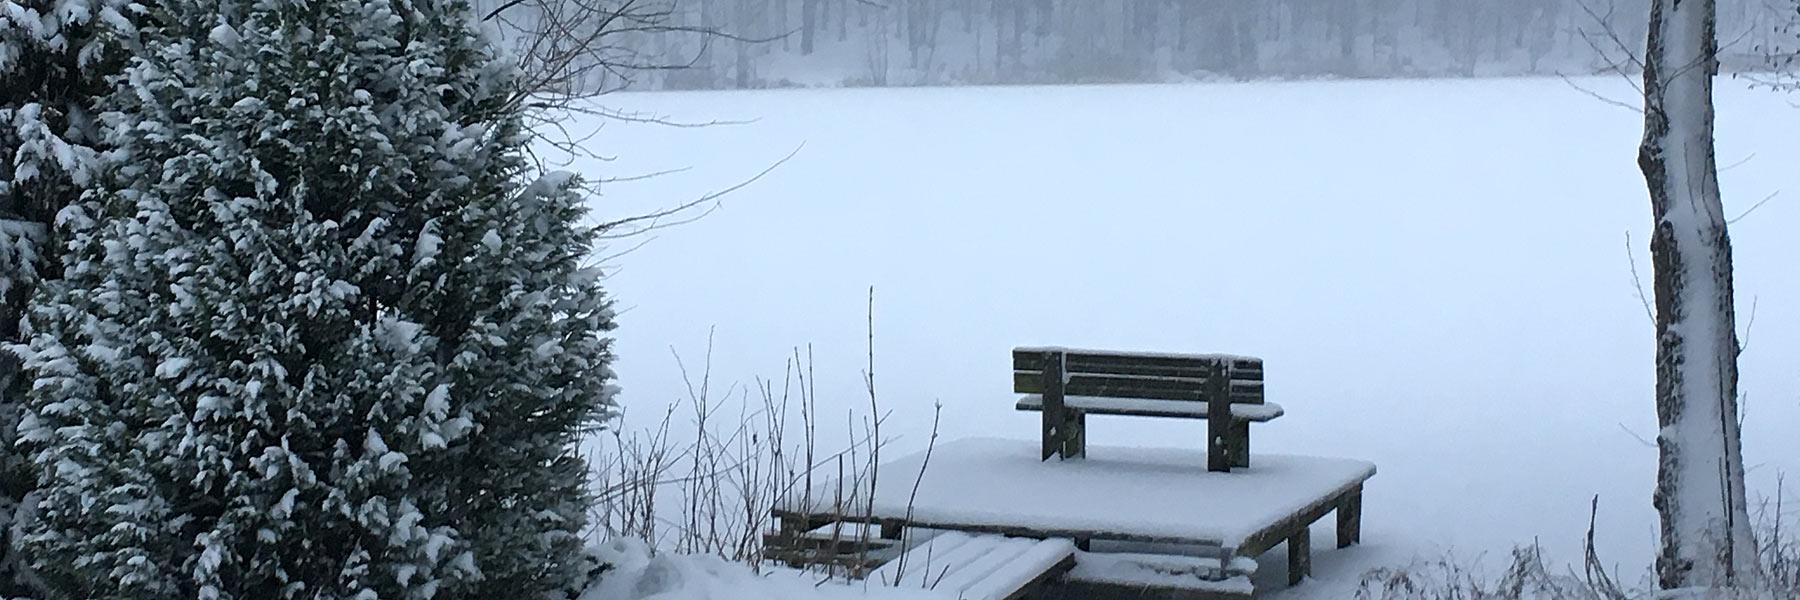 Winter - Haus am Gadowsee